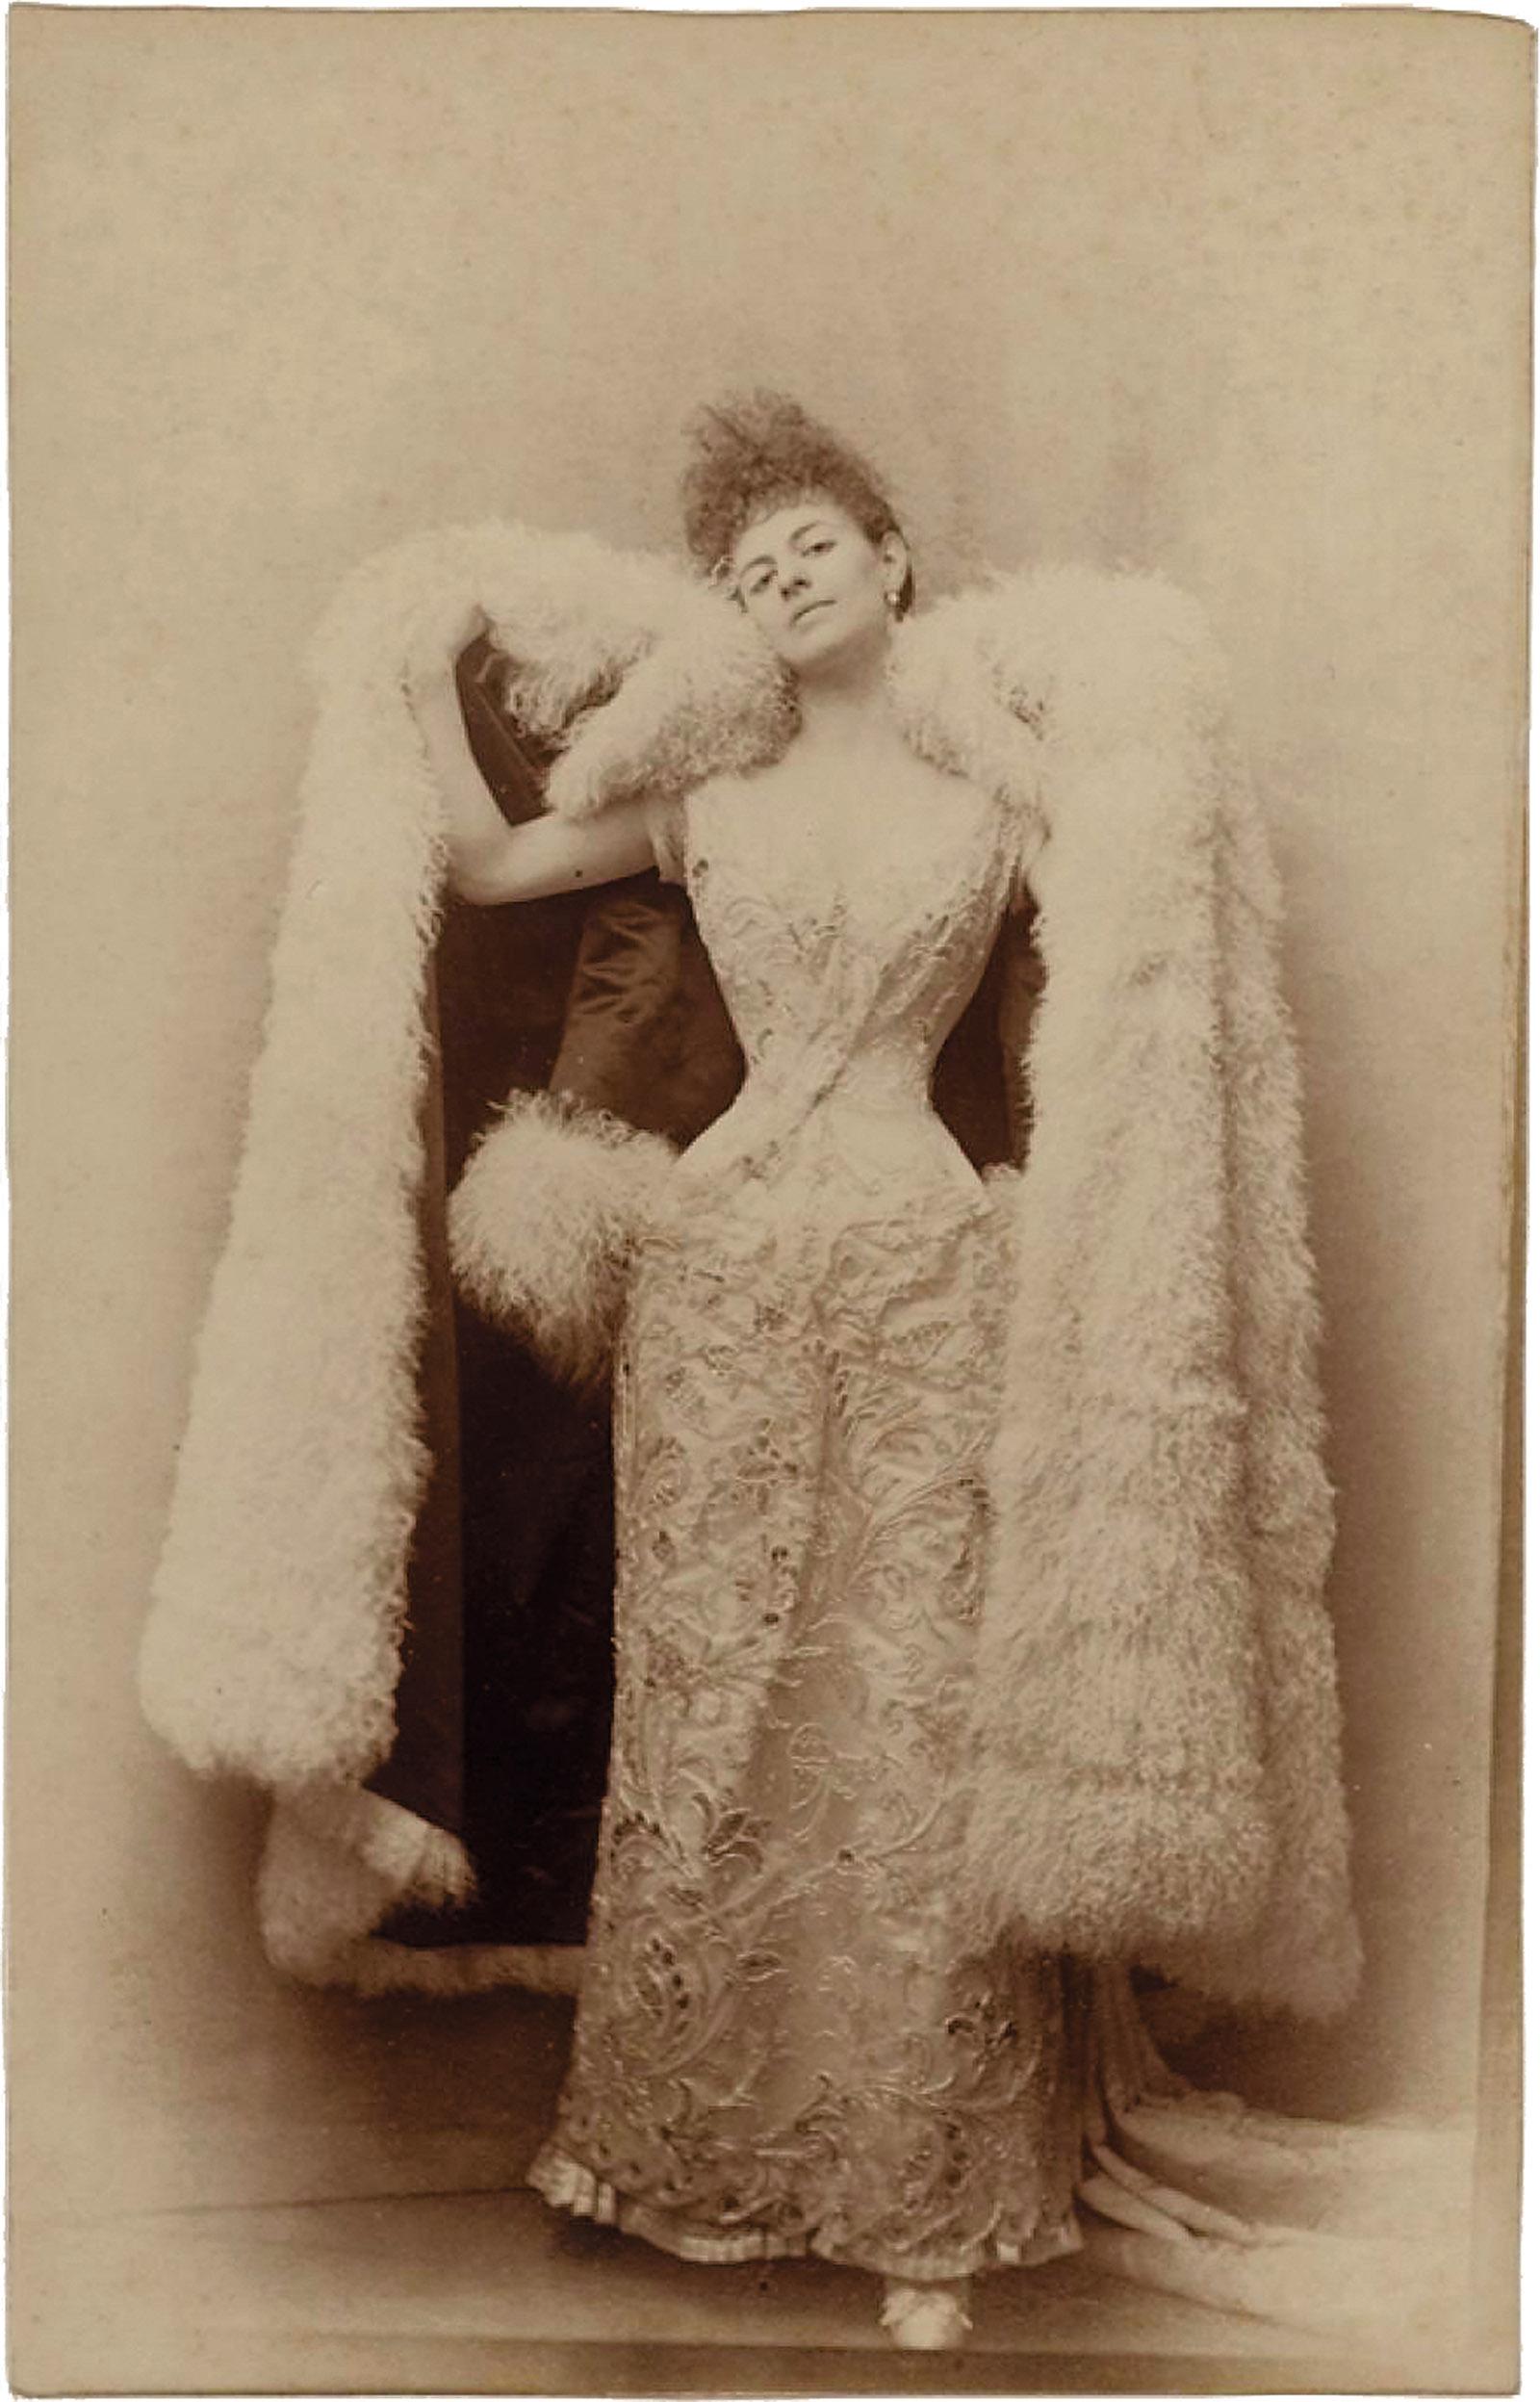 Élisabeth Greffulhe in her 'swan' persona; photograph by Otto Wegener, circa 1887